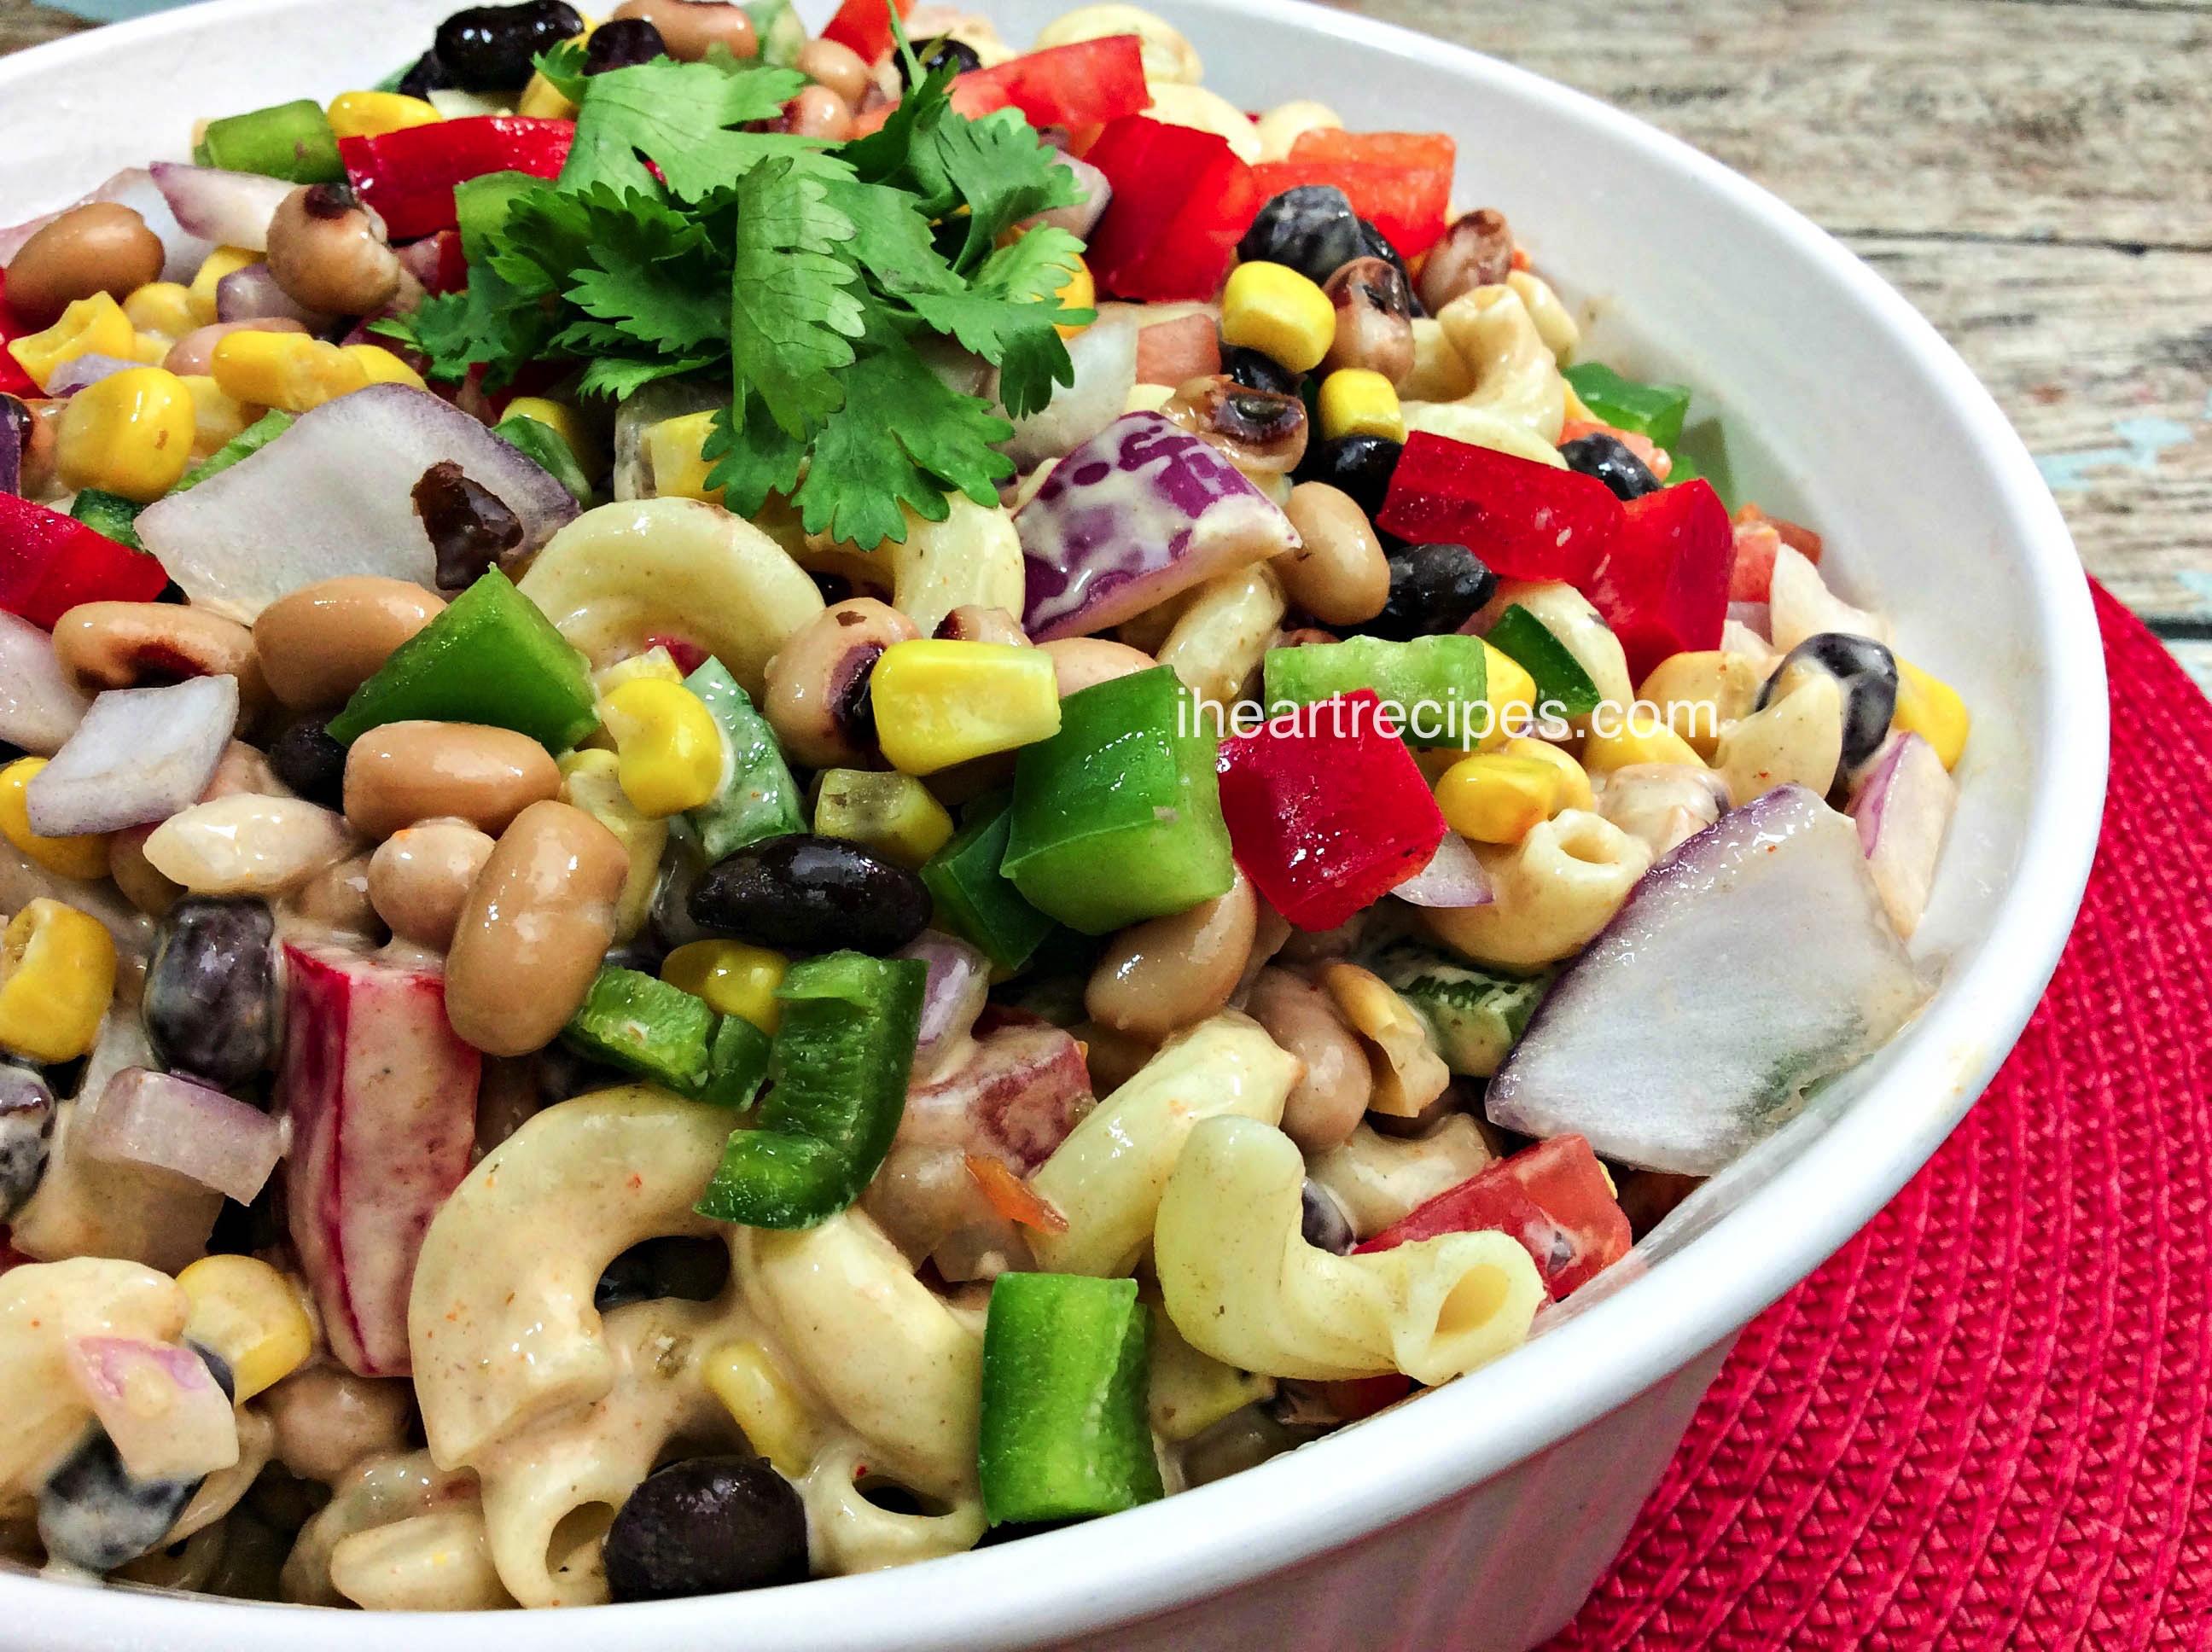 Texas Caviar Macaroni Salad is a refreshing summer salad with a kick of heat